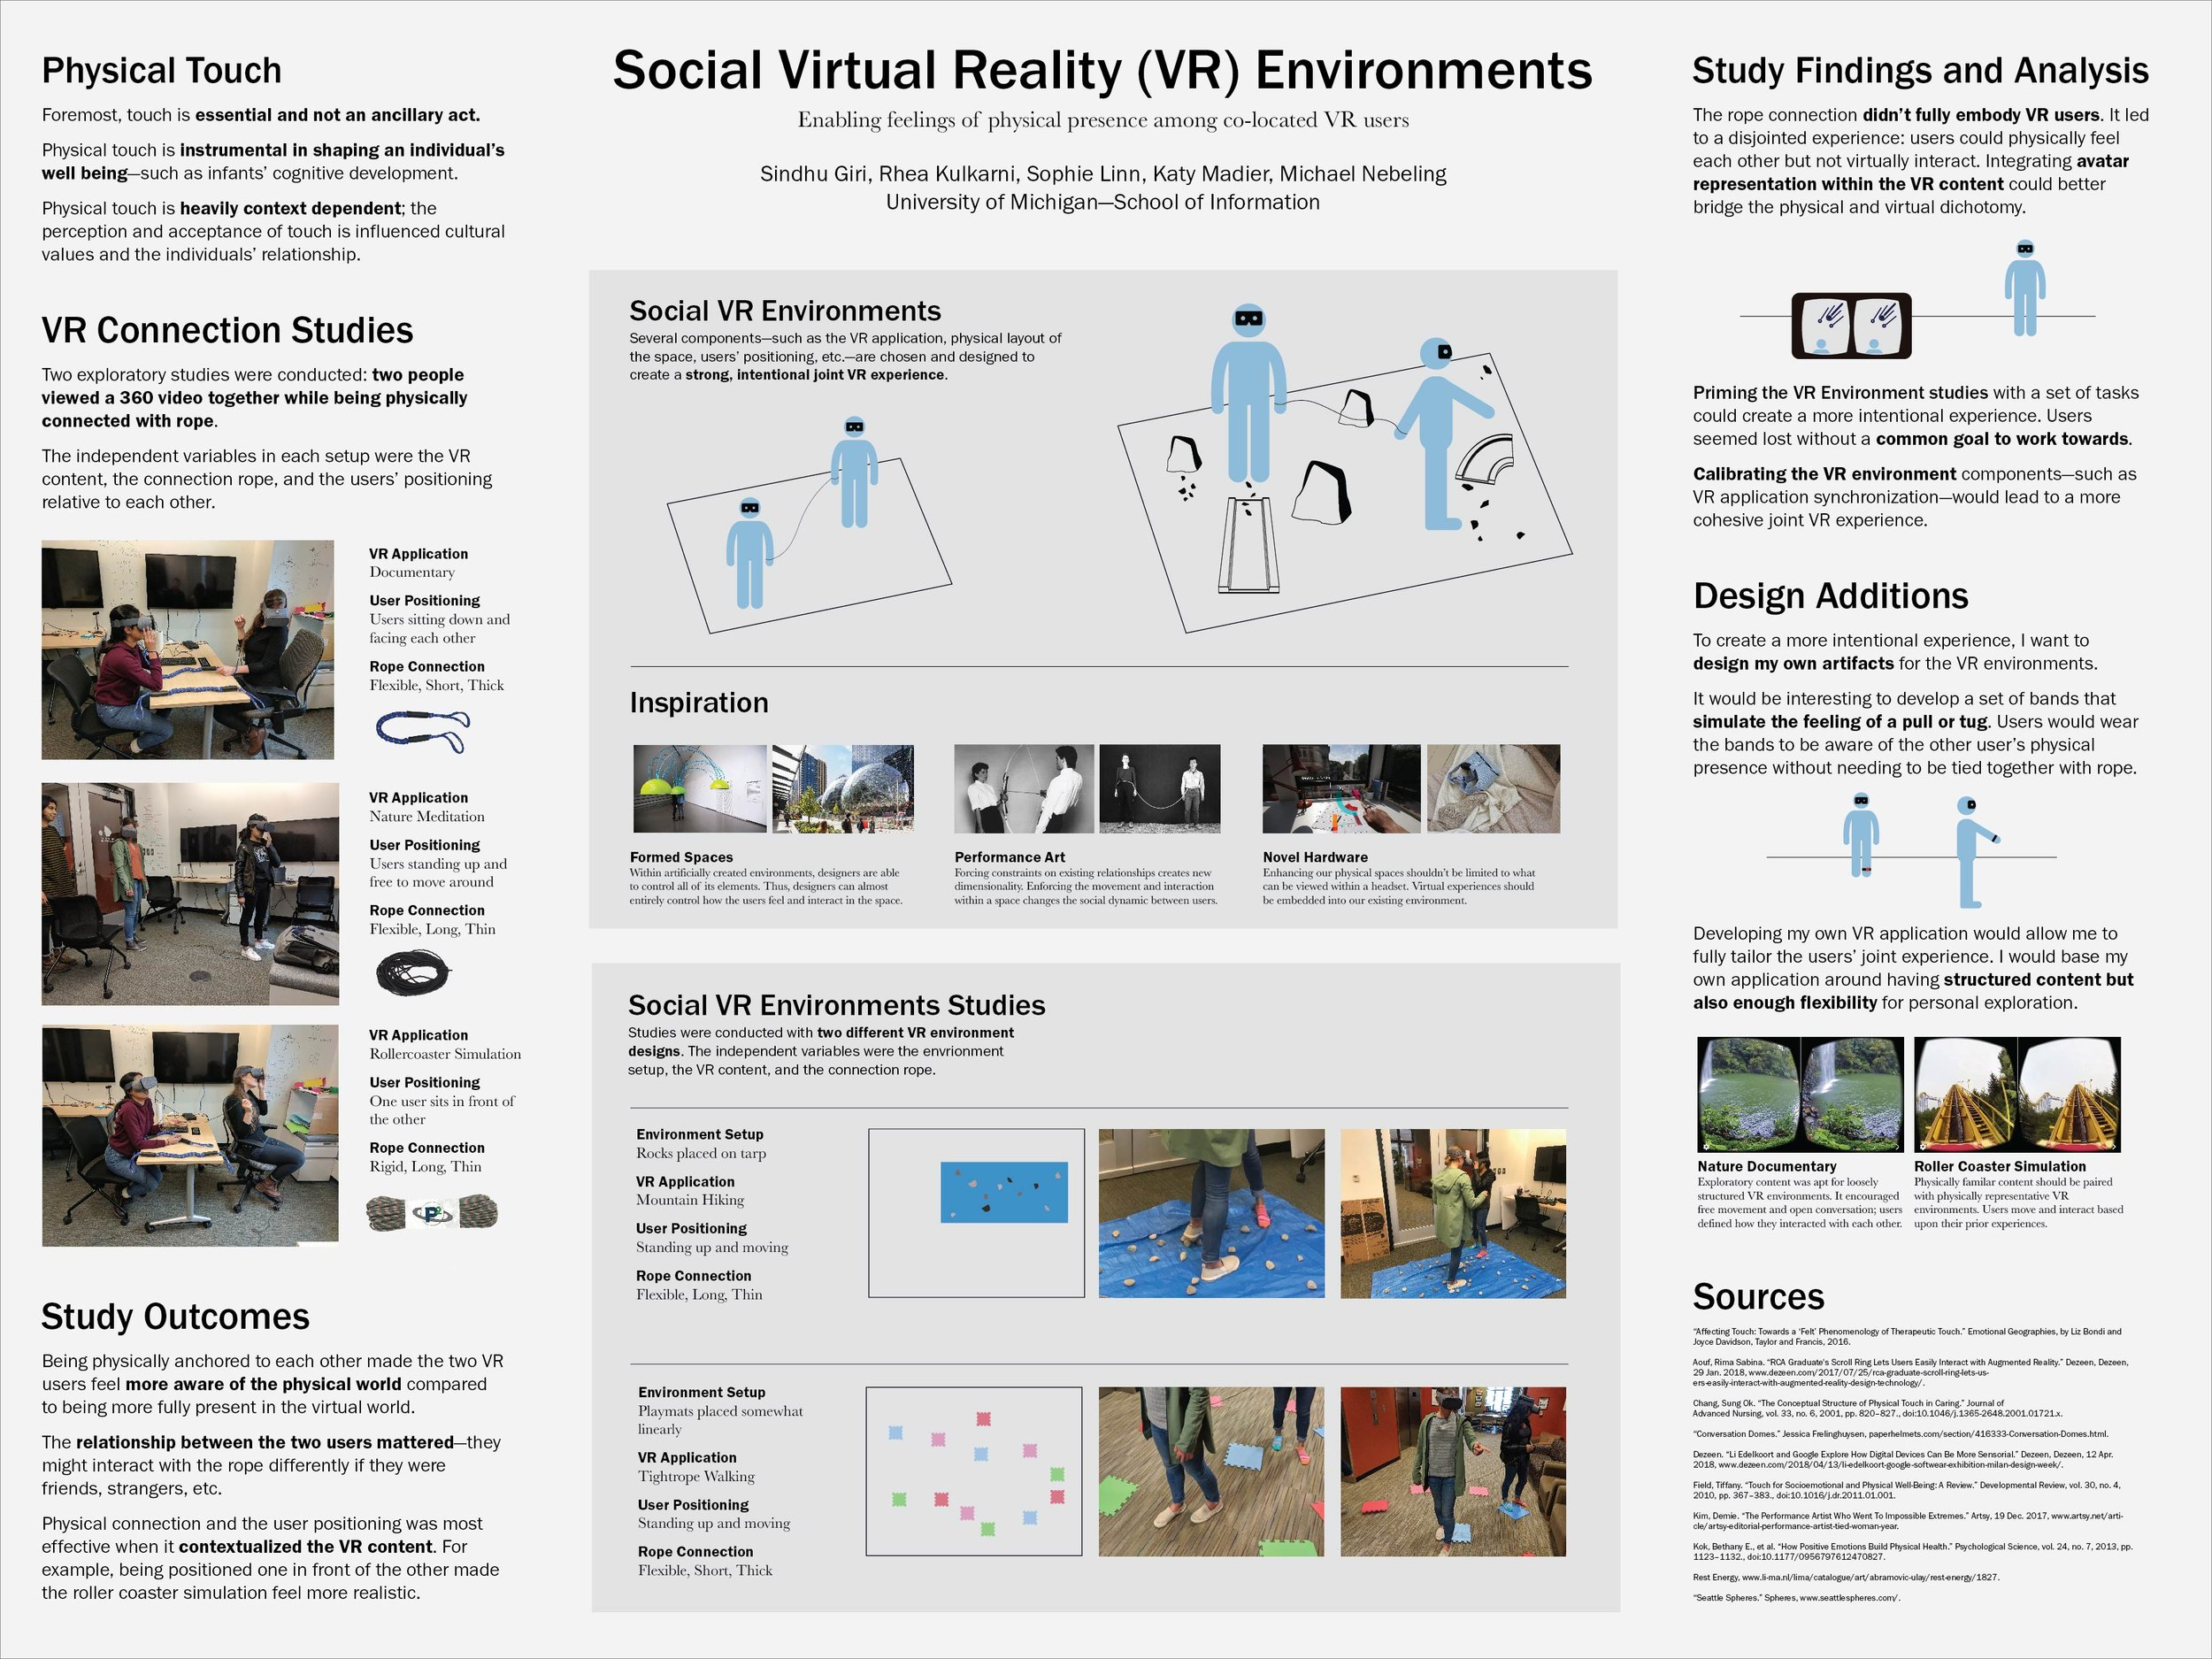 Social, Co-located VR (In Progress) — SINDHU GIRI